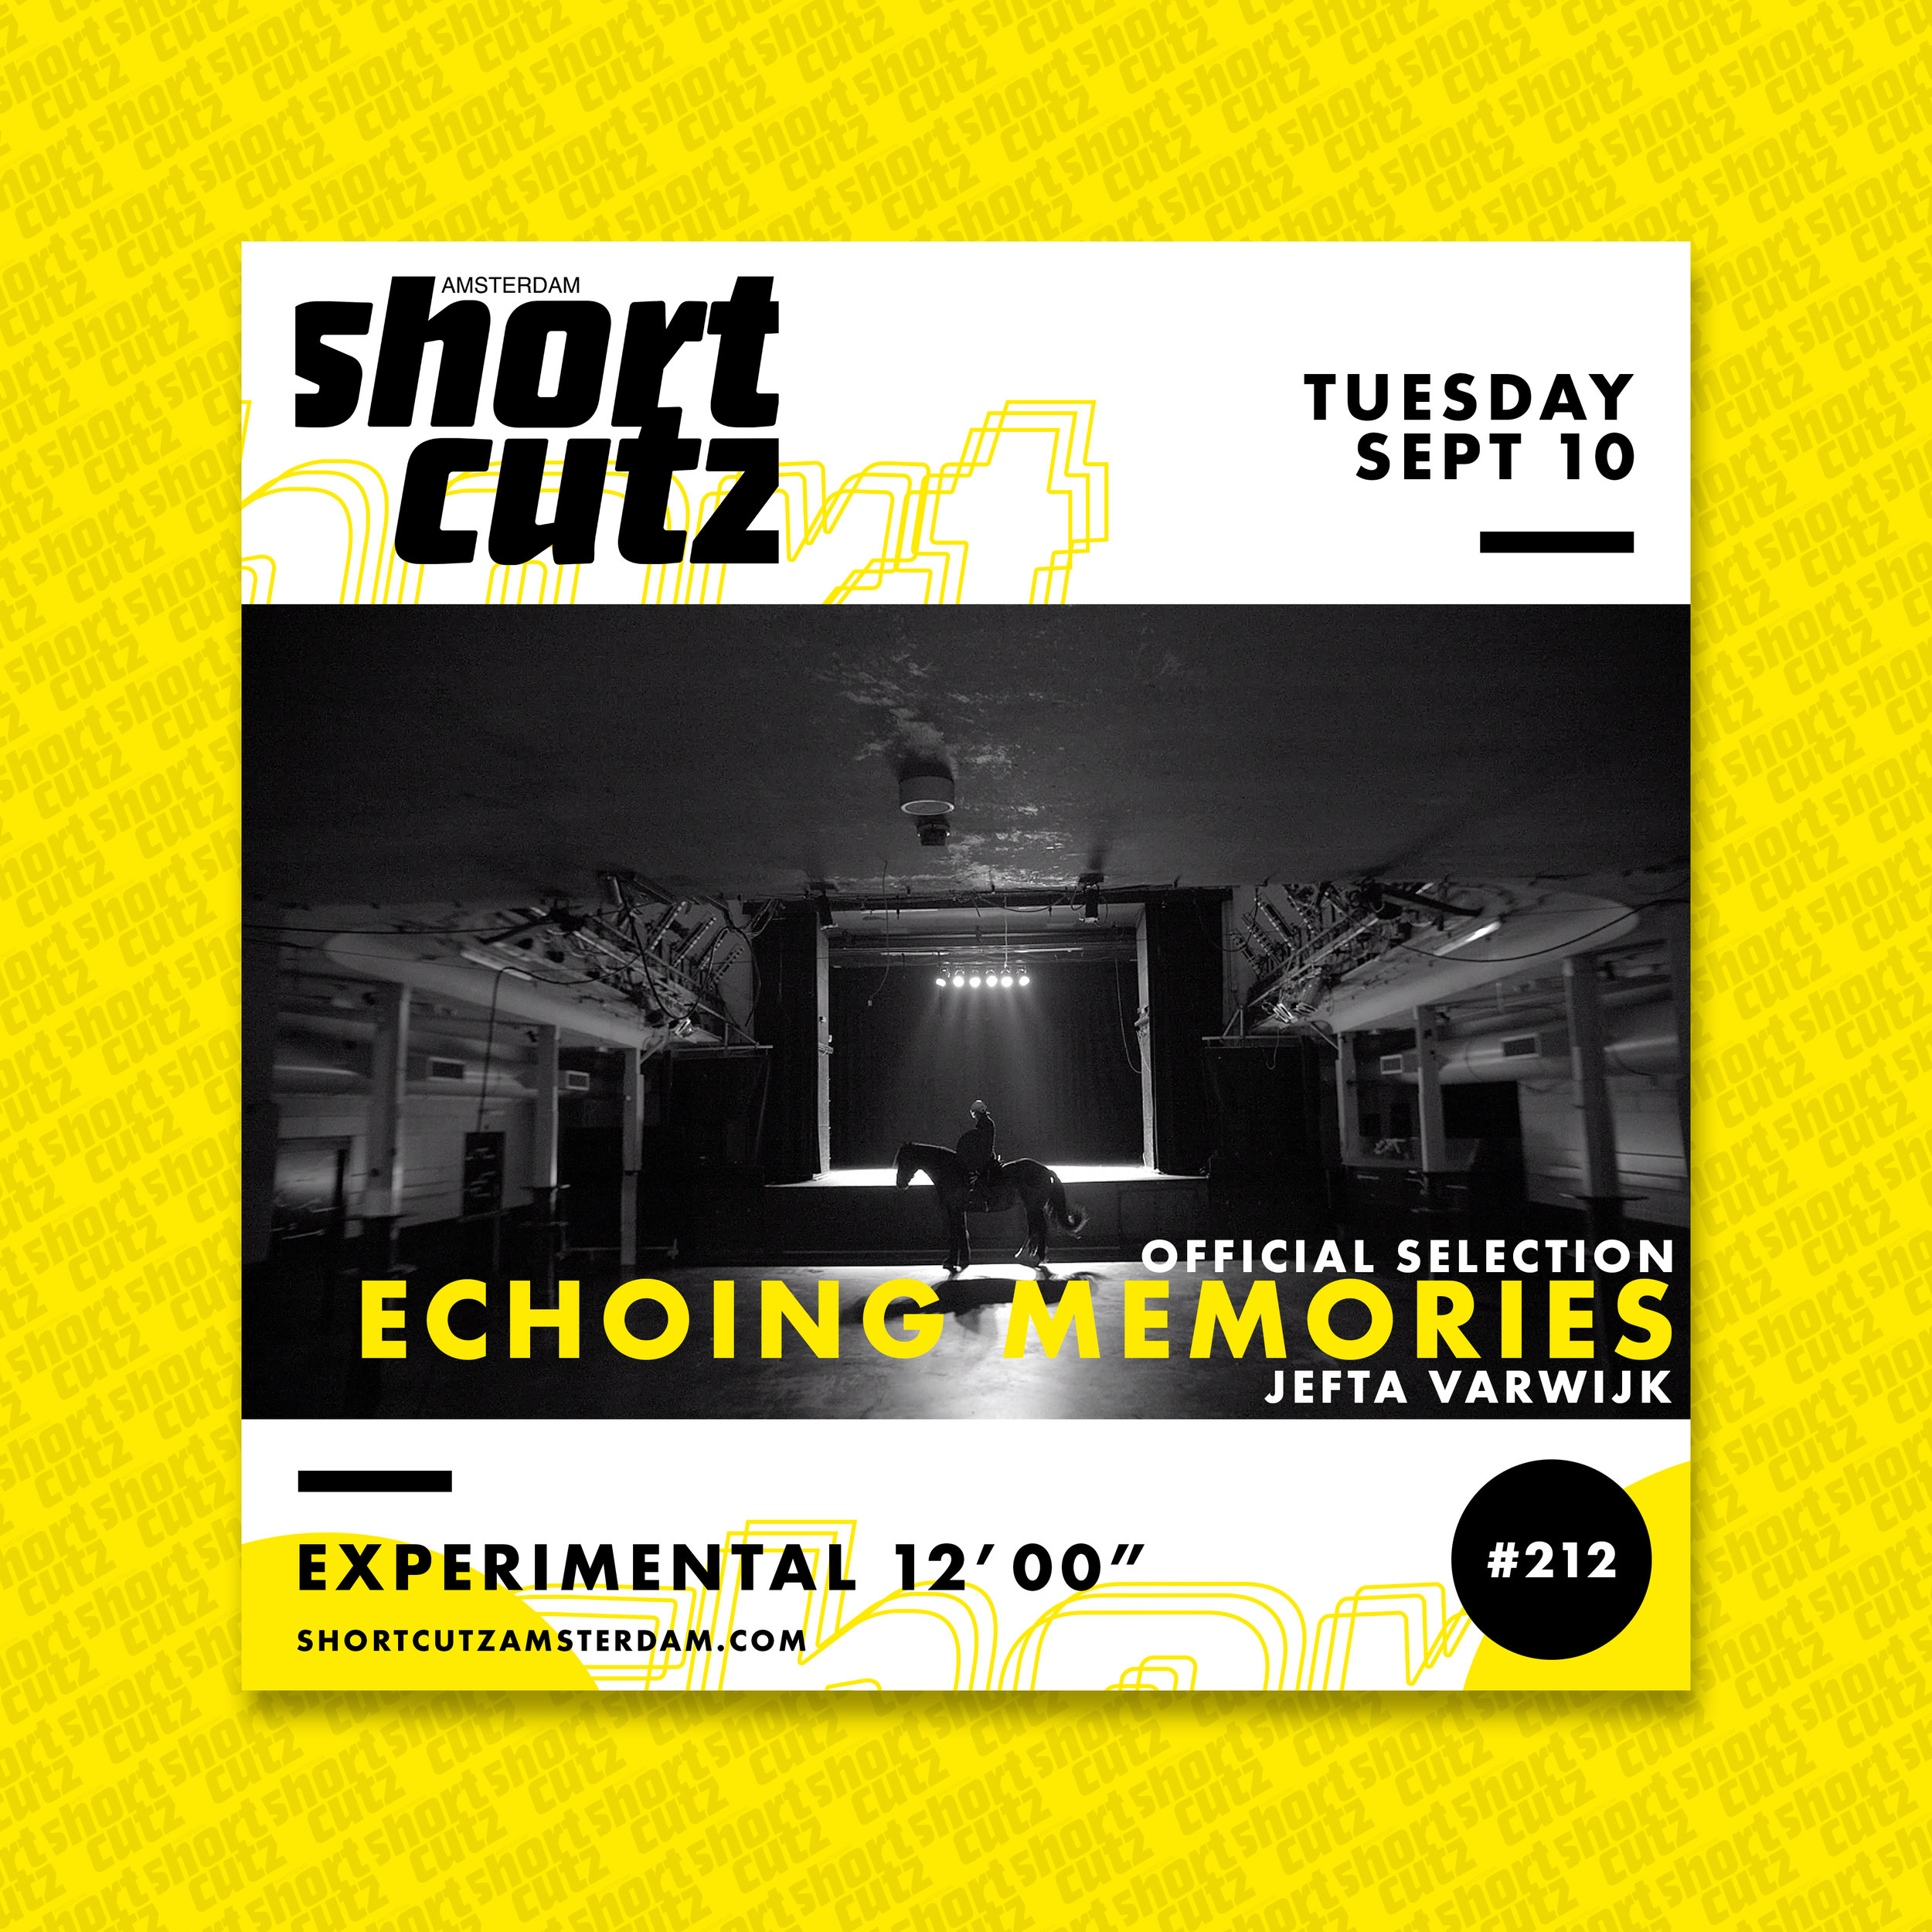 #212 Poster Echoing Memories.jpg